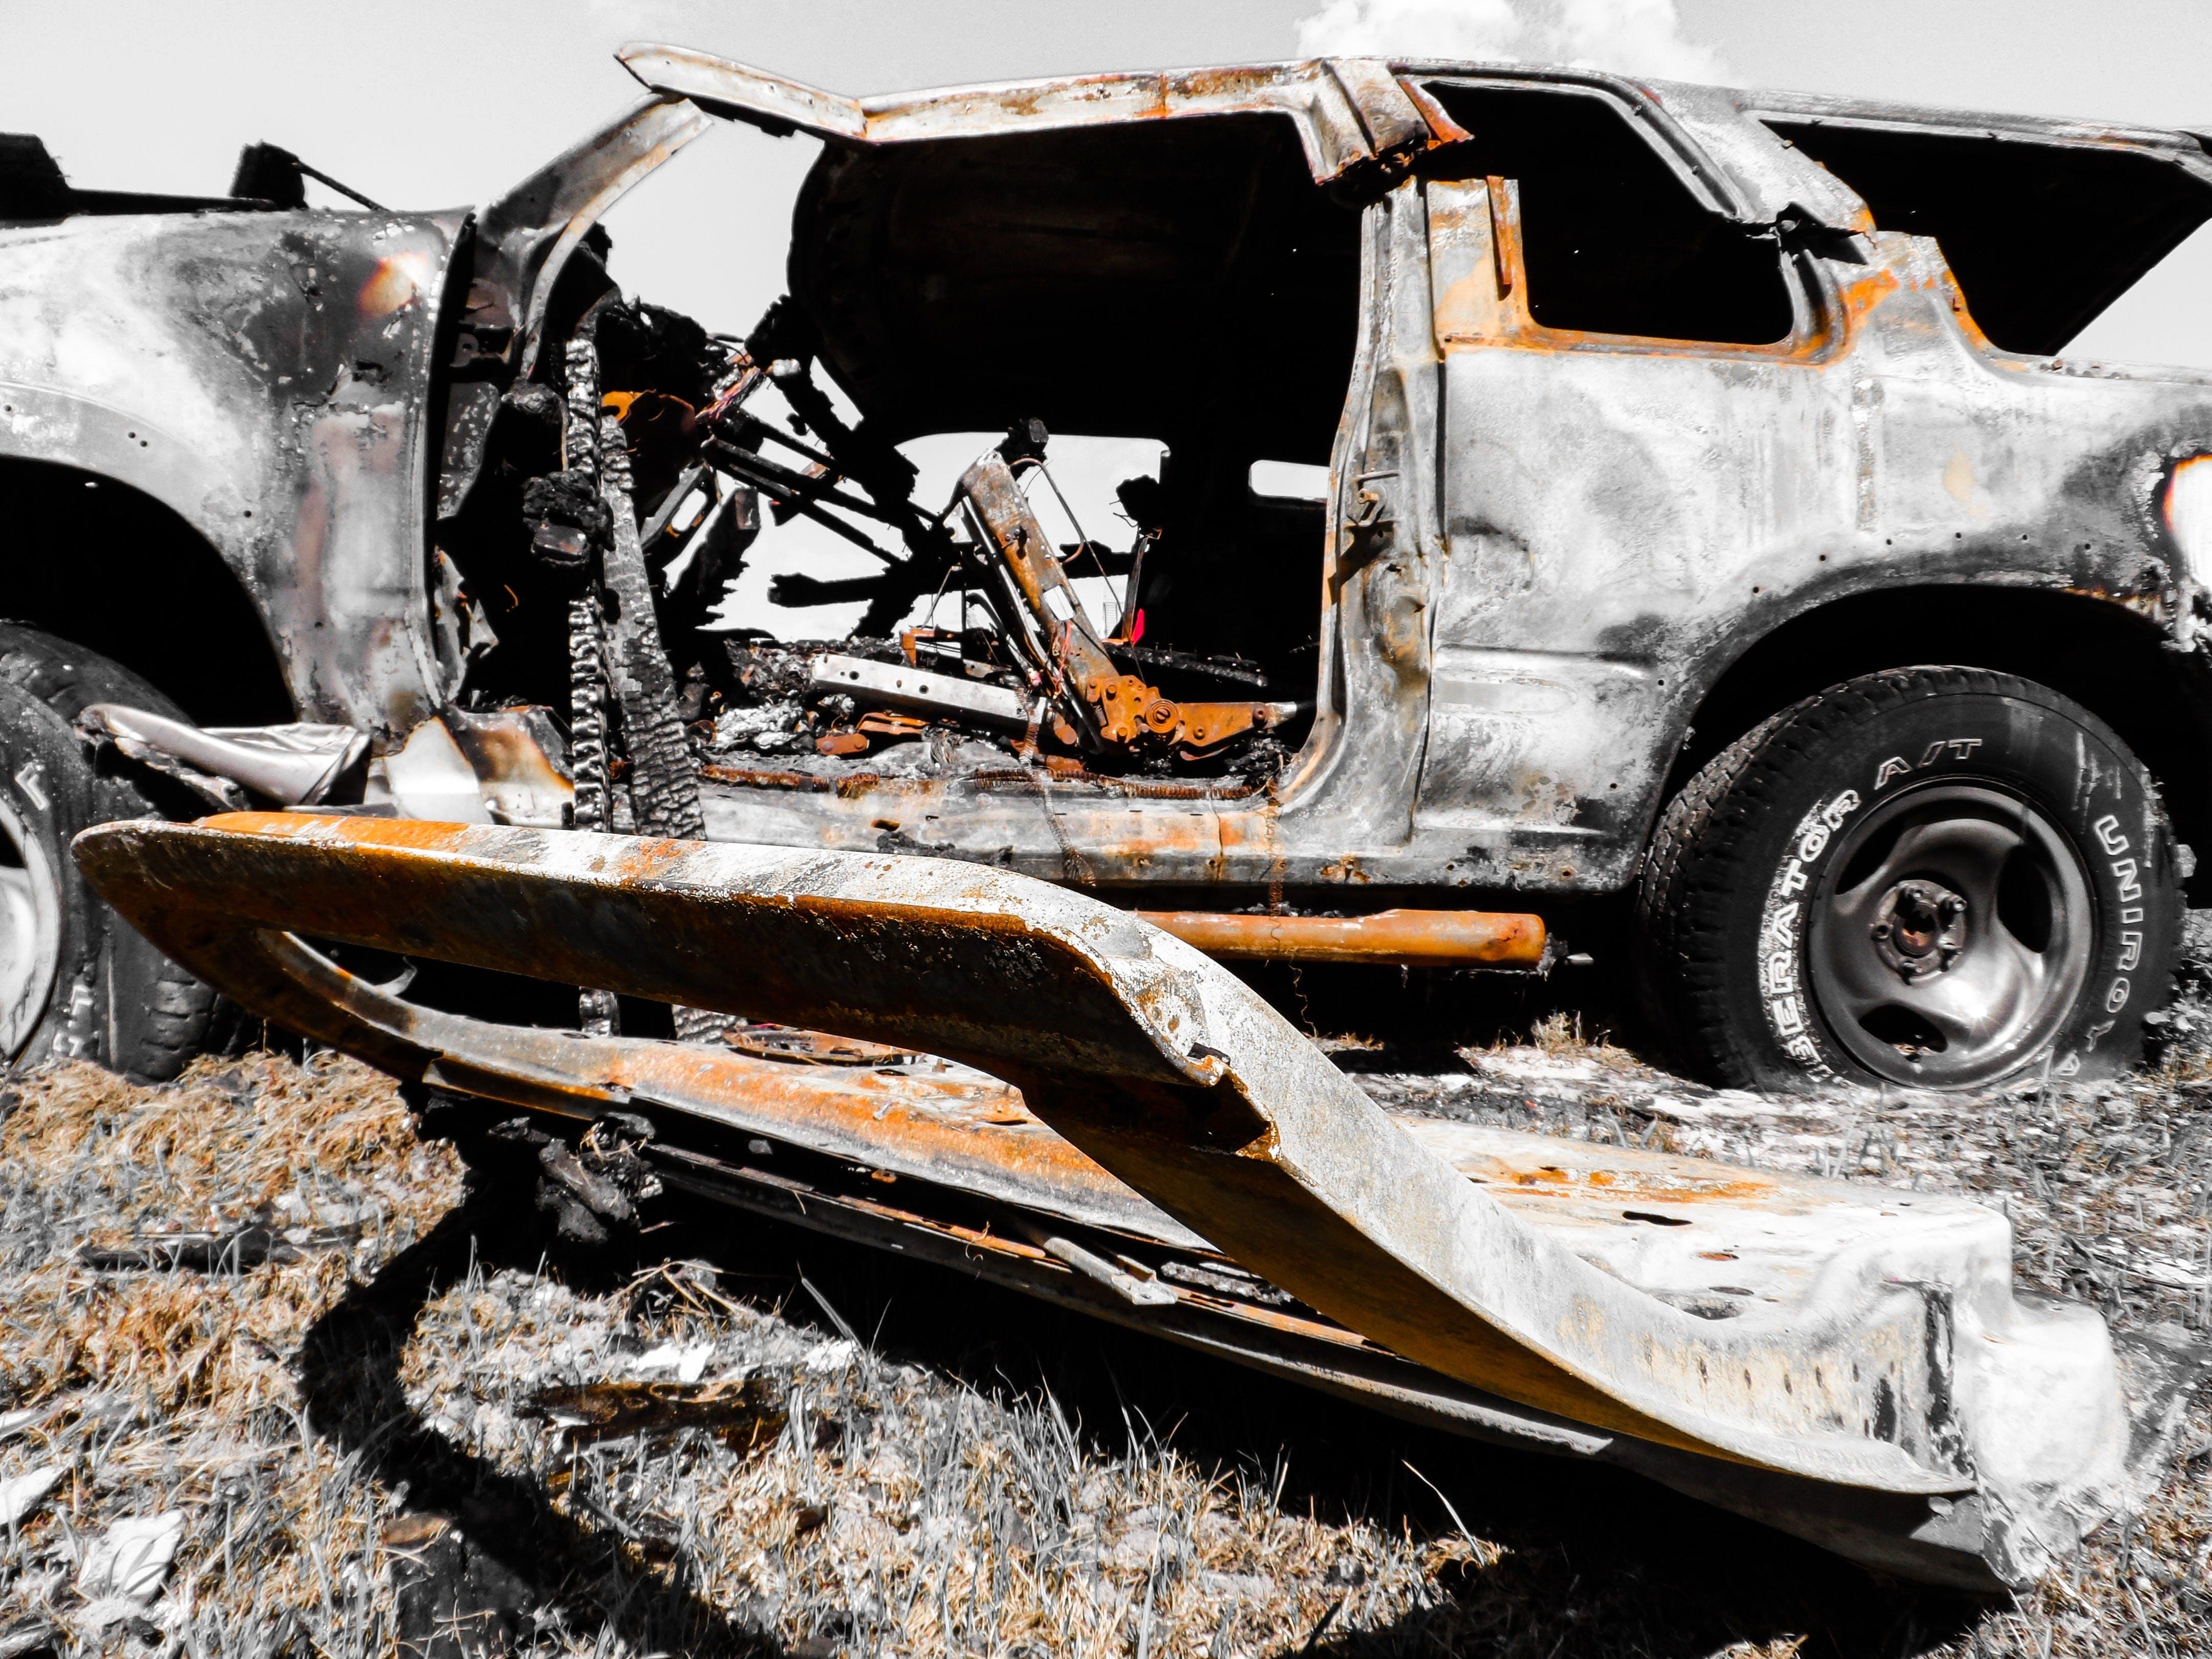 Gratis arkivbilde med brent, forlatt, kjøretøy, rusten